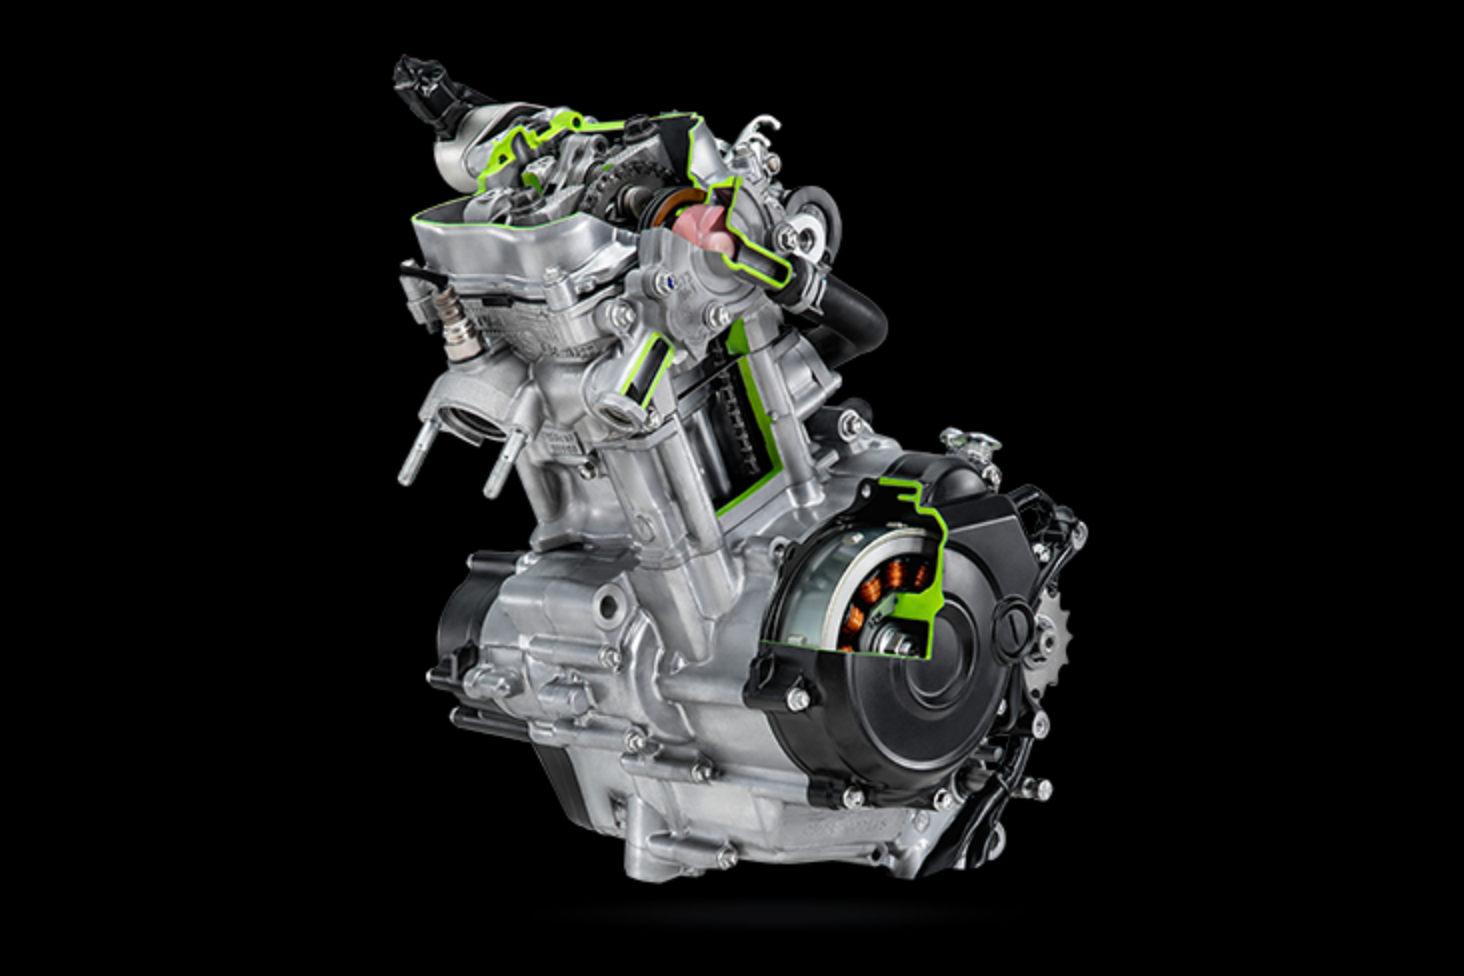 Spesifikasi Yamaha Exciter 155 VVA, Ini Resep Yang Bikin Performanya Ganas!